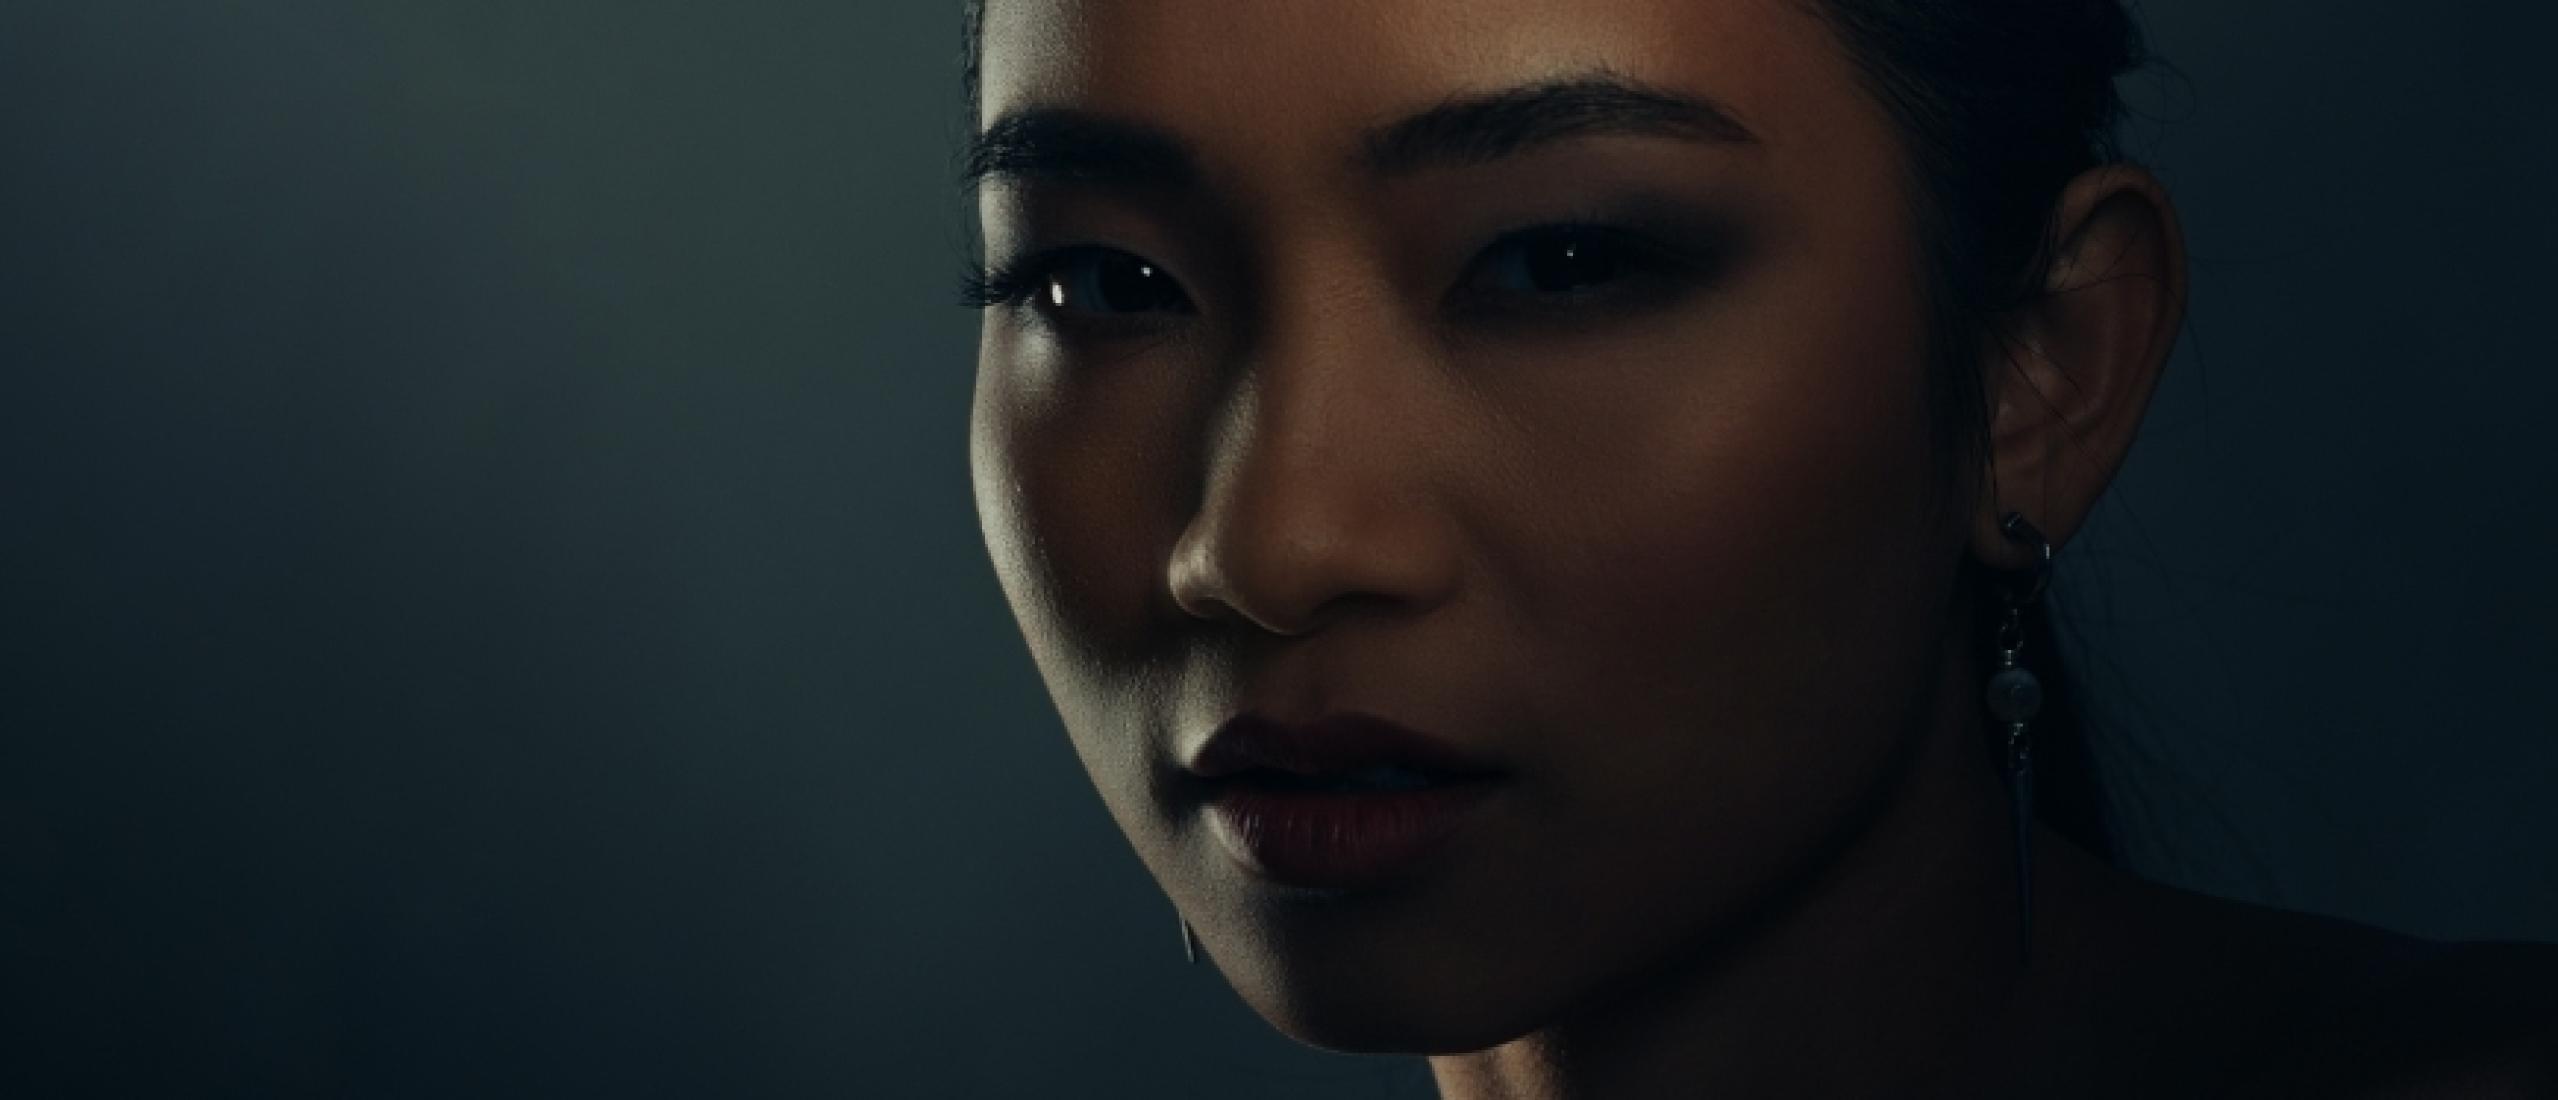 Portrait Beauty Shot - With a Foldable Stripbox